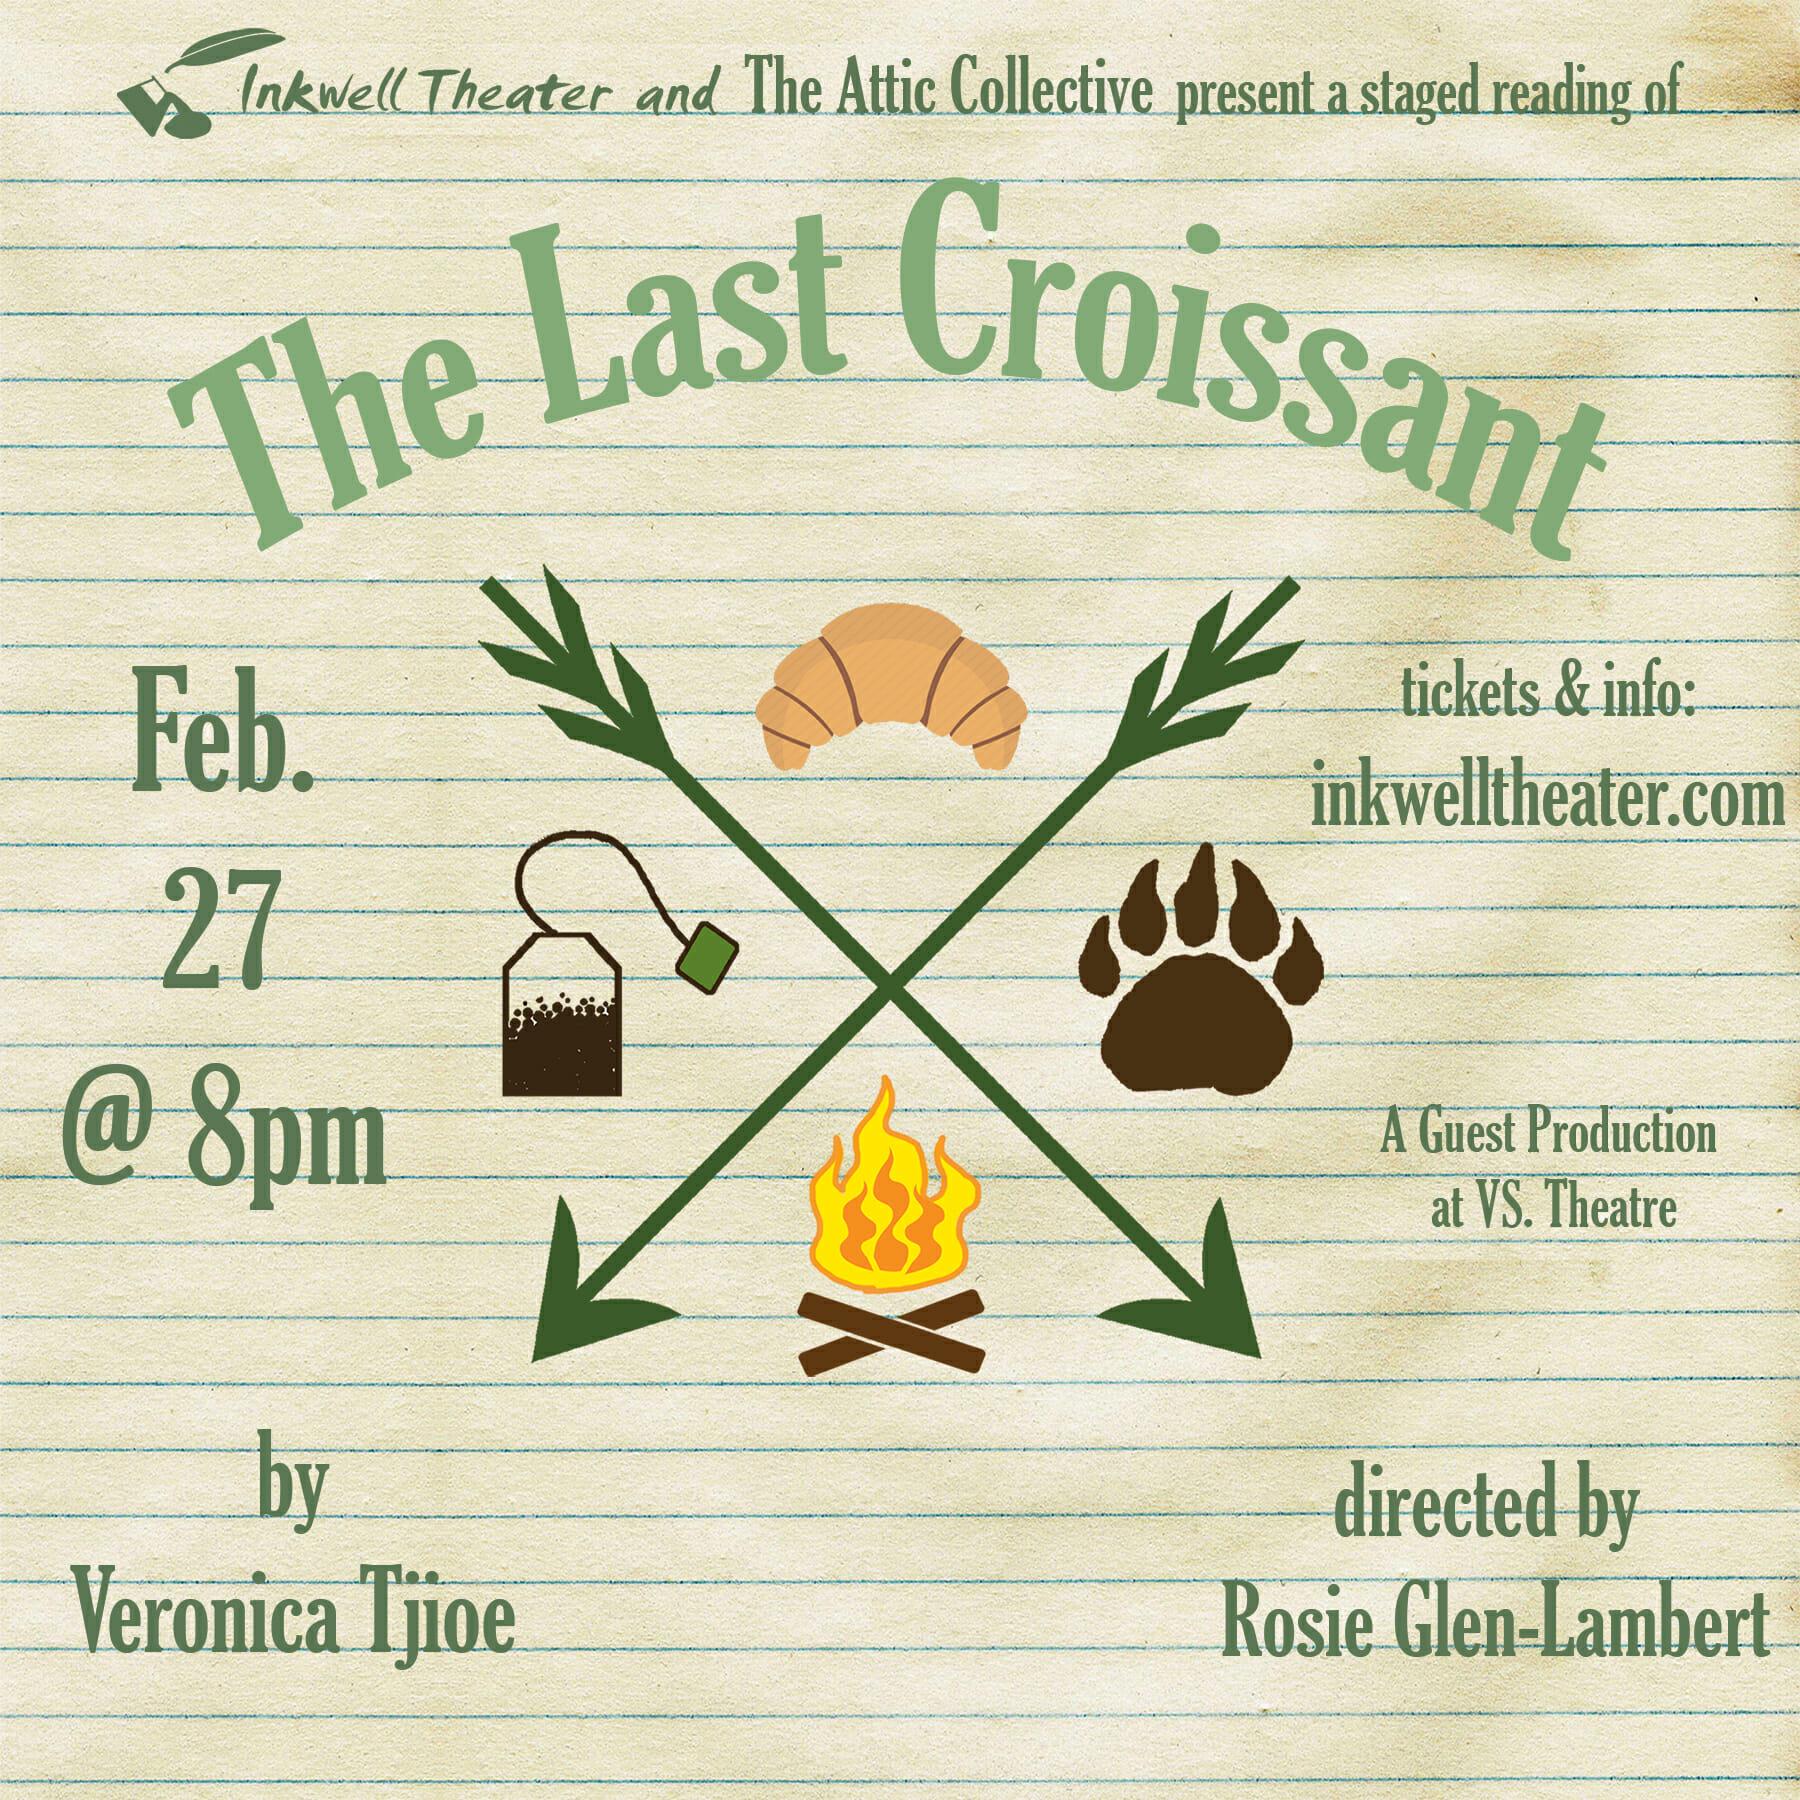 The Last Croissant